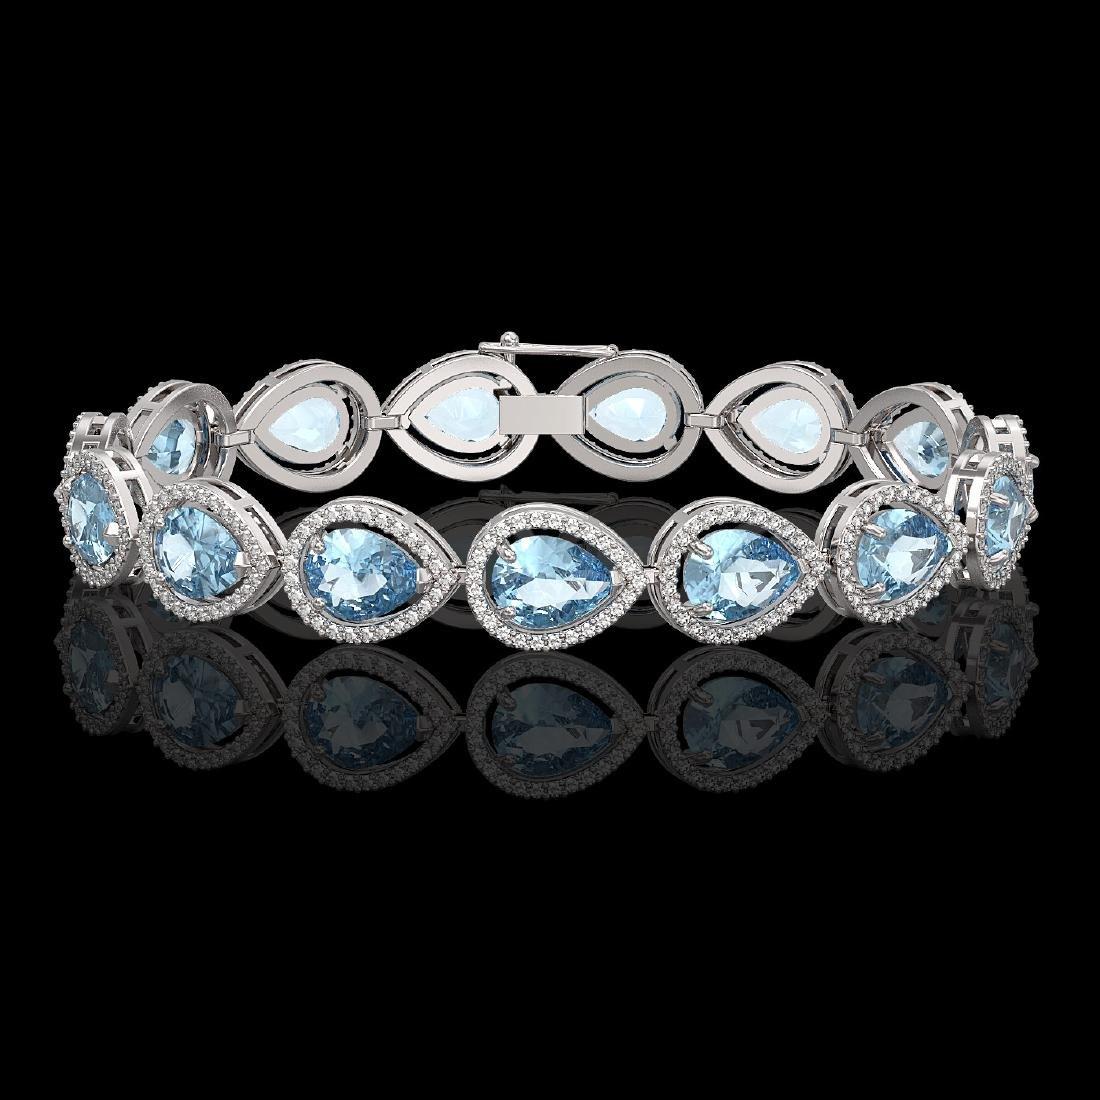 19.55 CTW Sky Topaz & Diamond Halo Bracelet 10K White